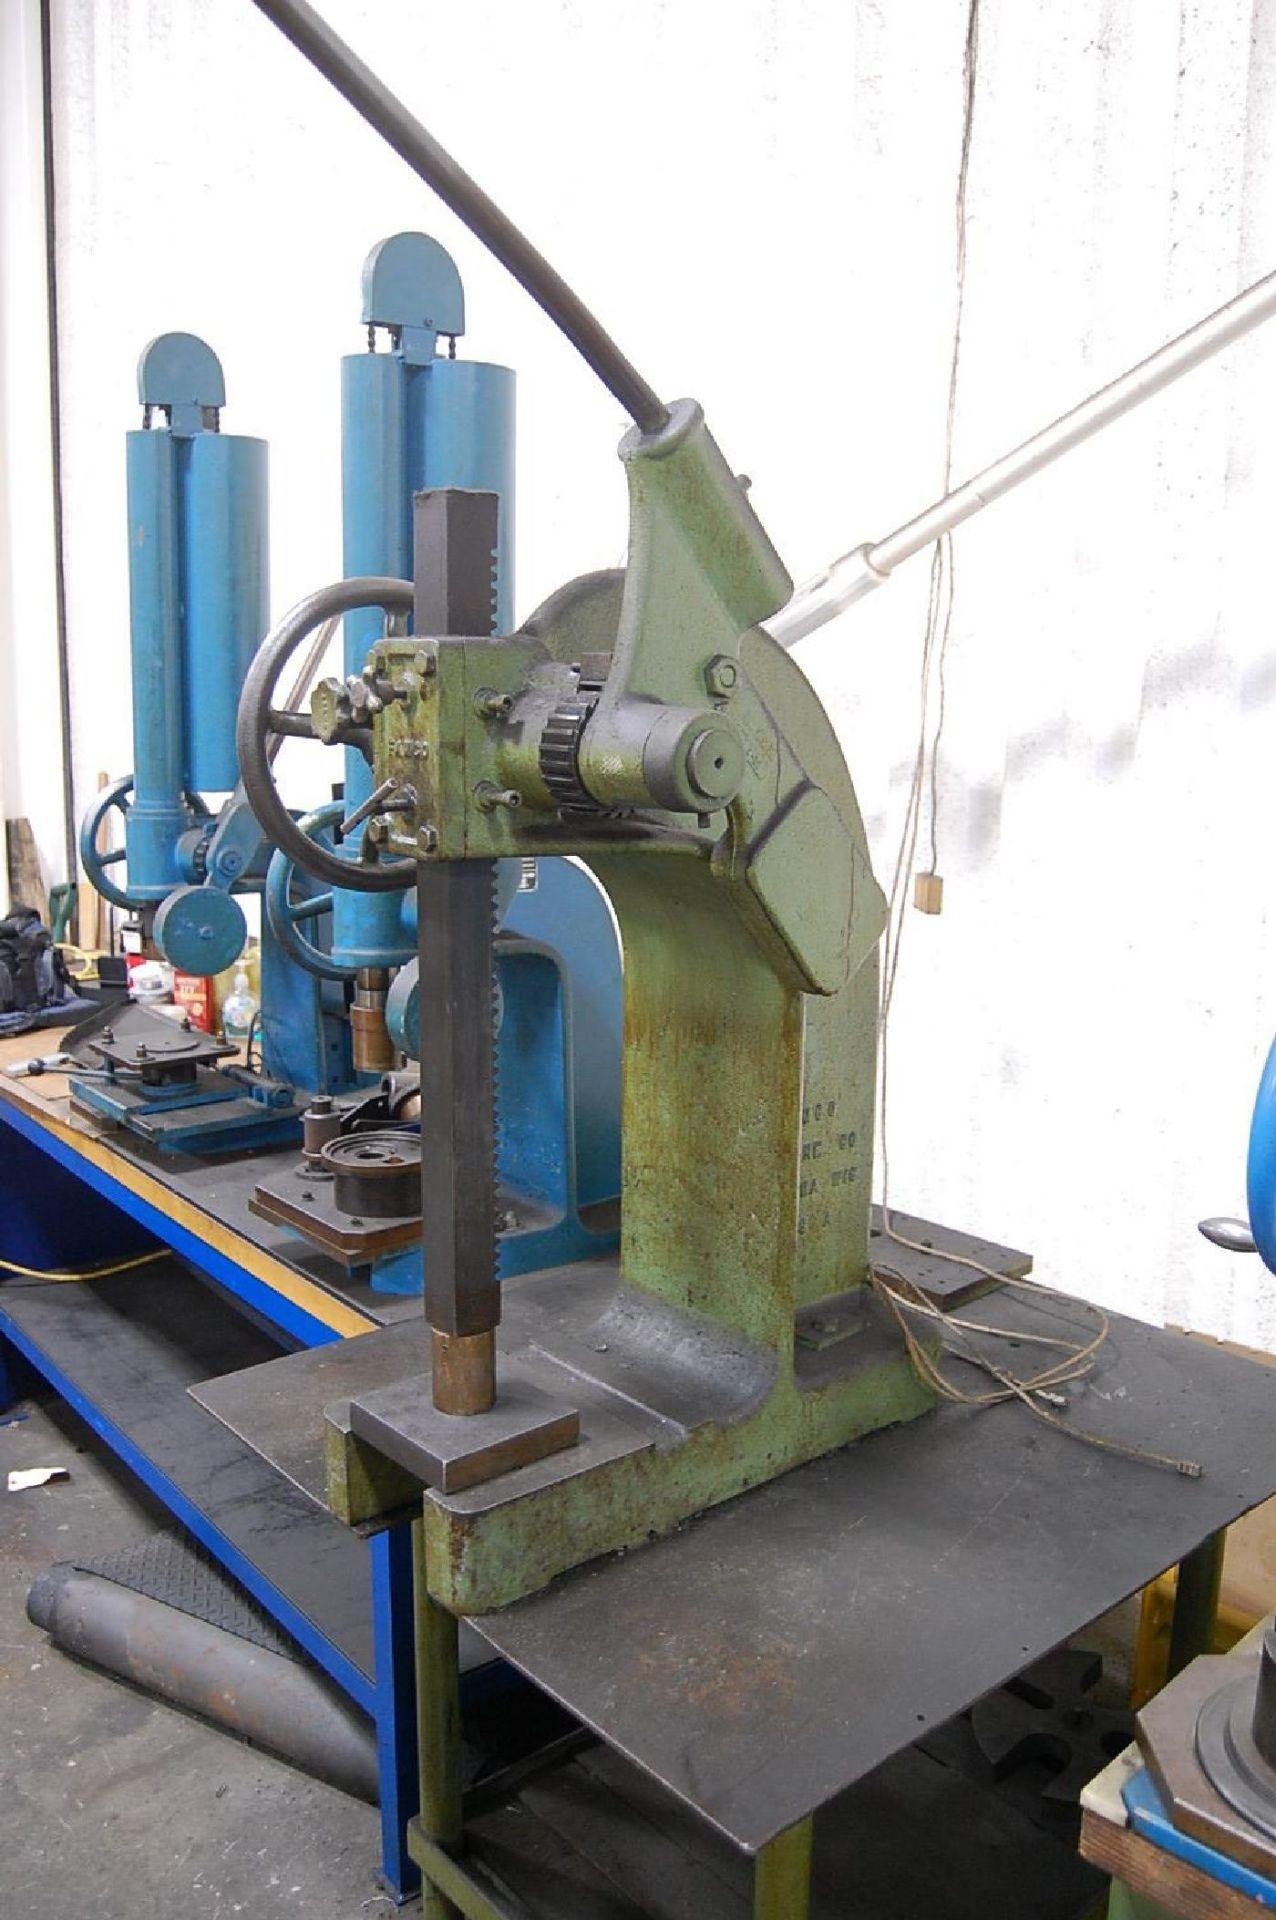 Lot 1 - Famco Model 4R 6-Ton Arbor Press